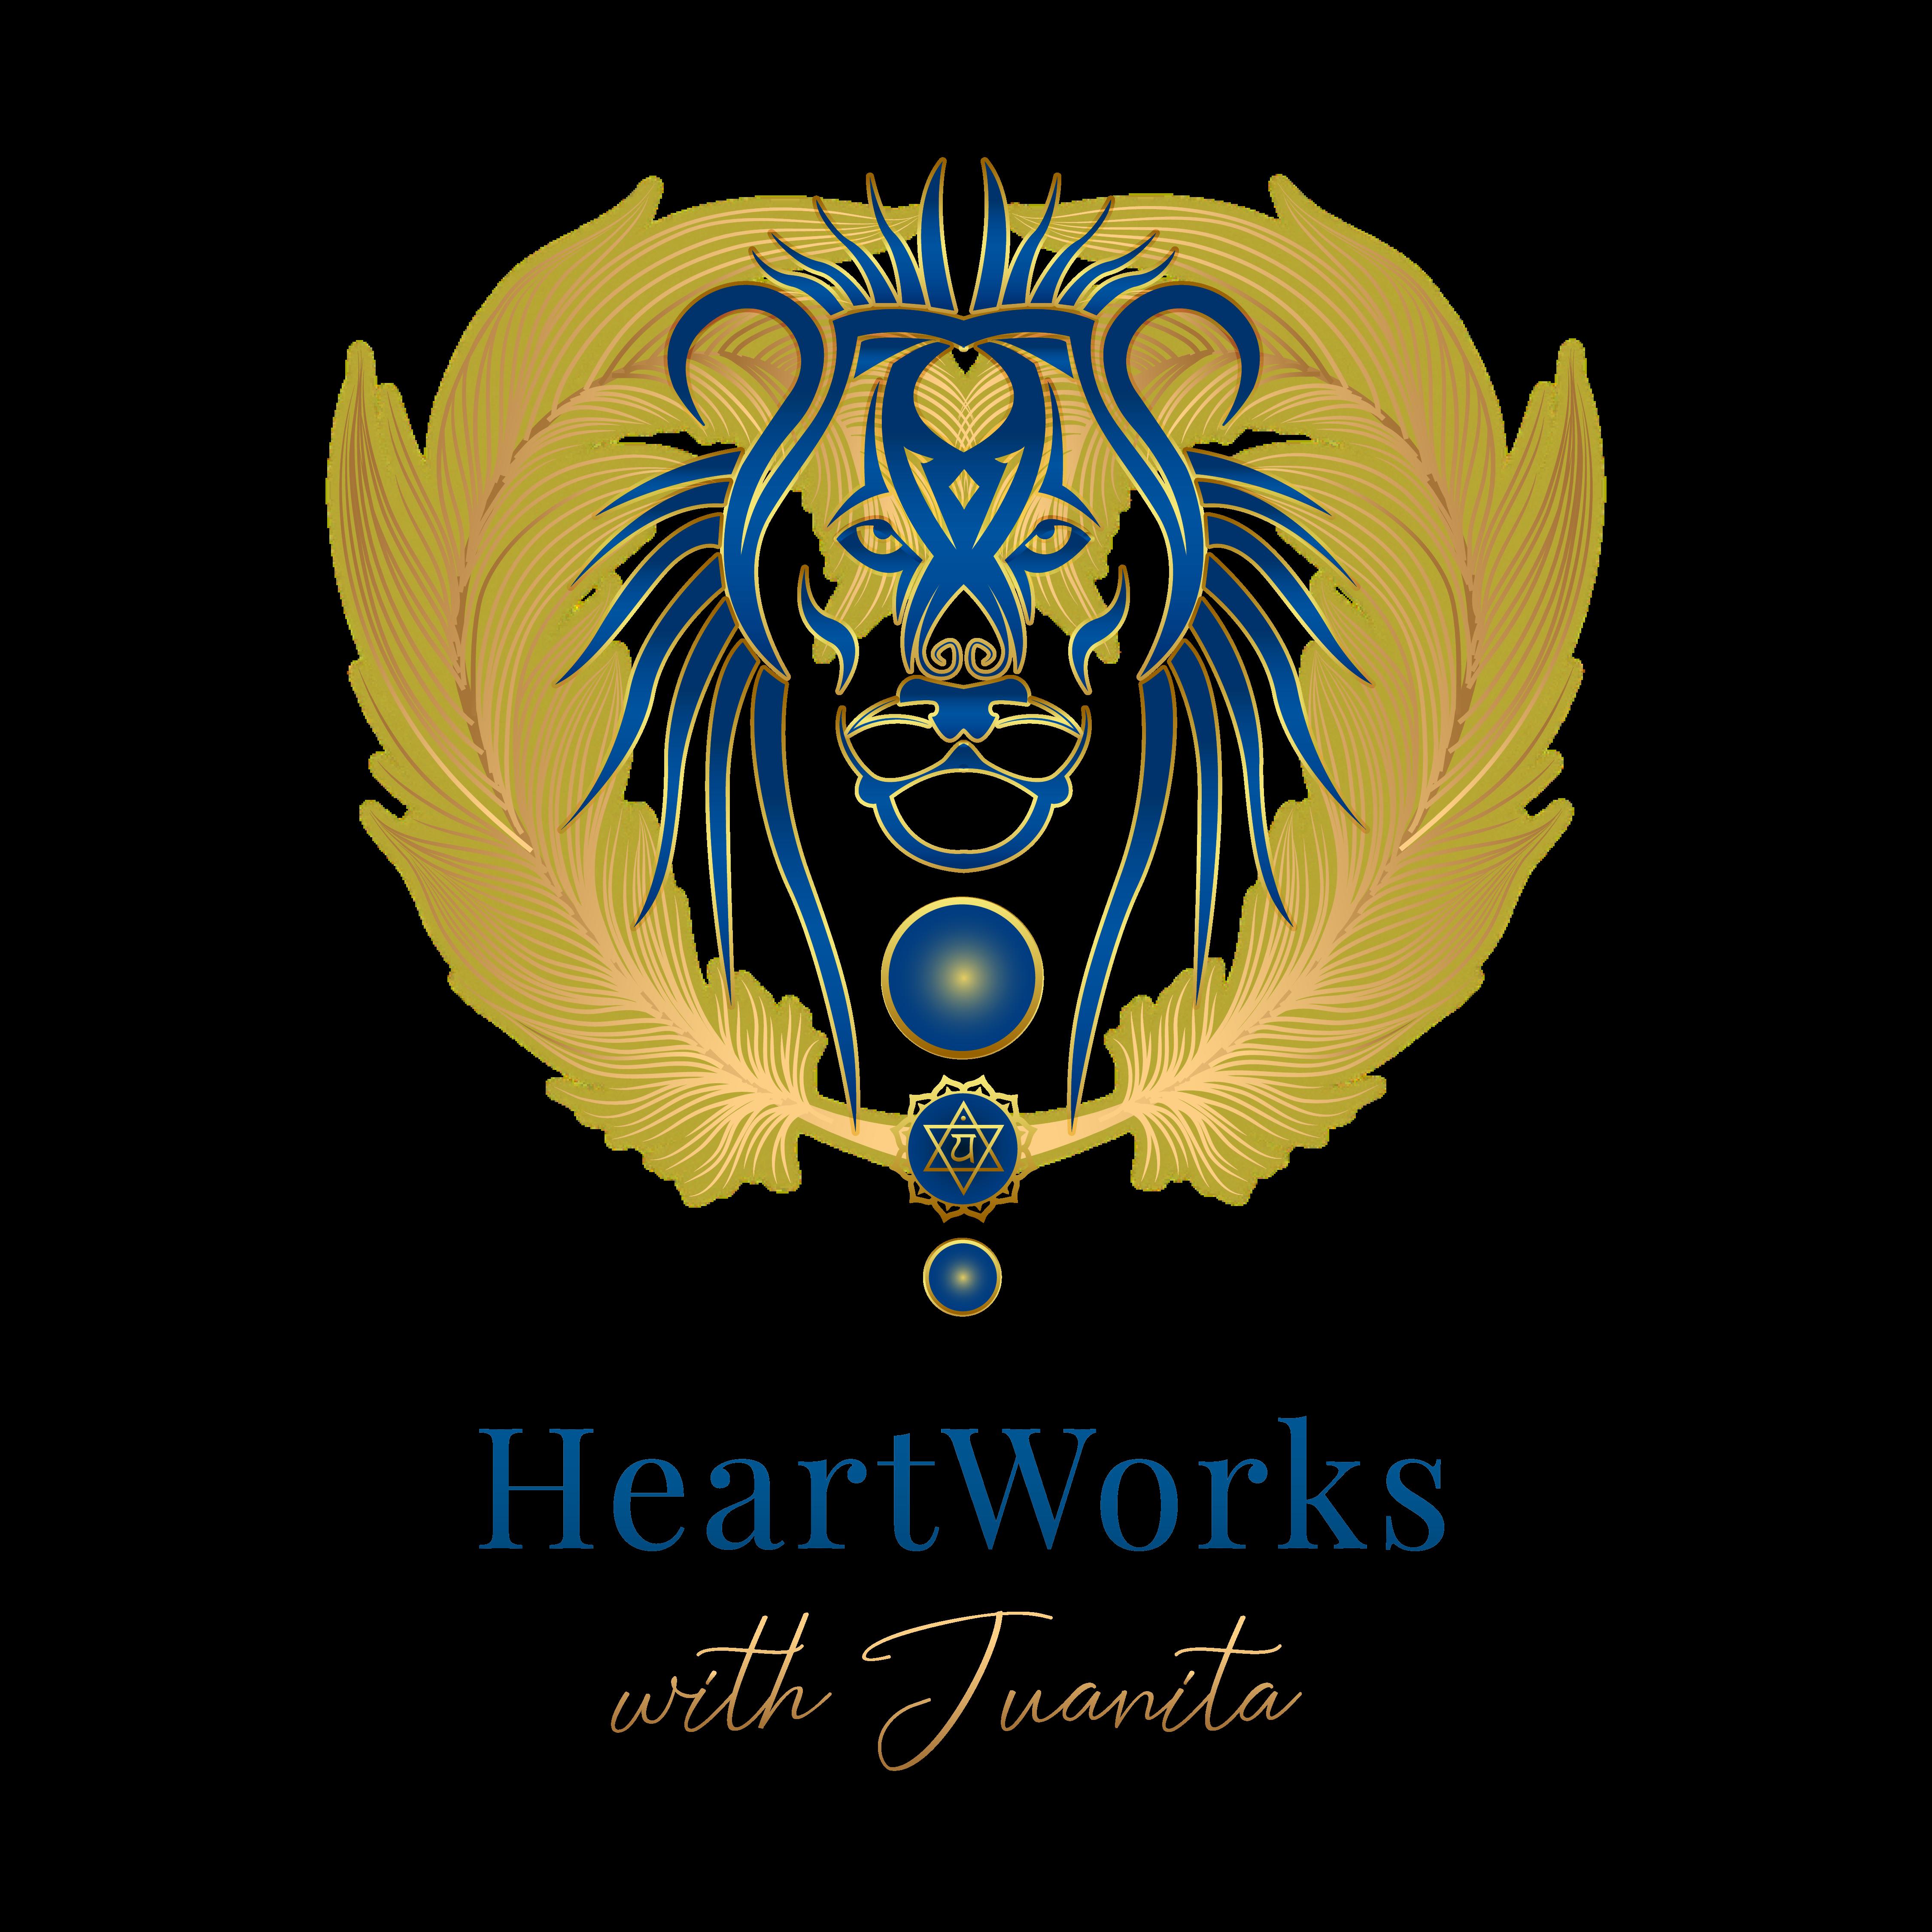 HeartWorks with Juanita